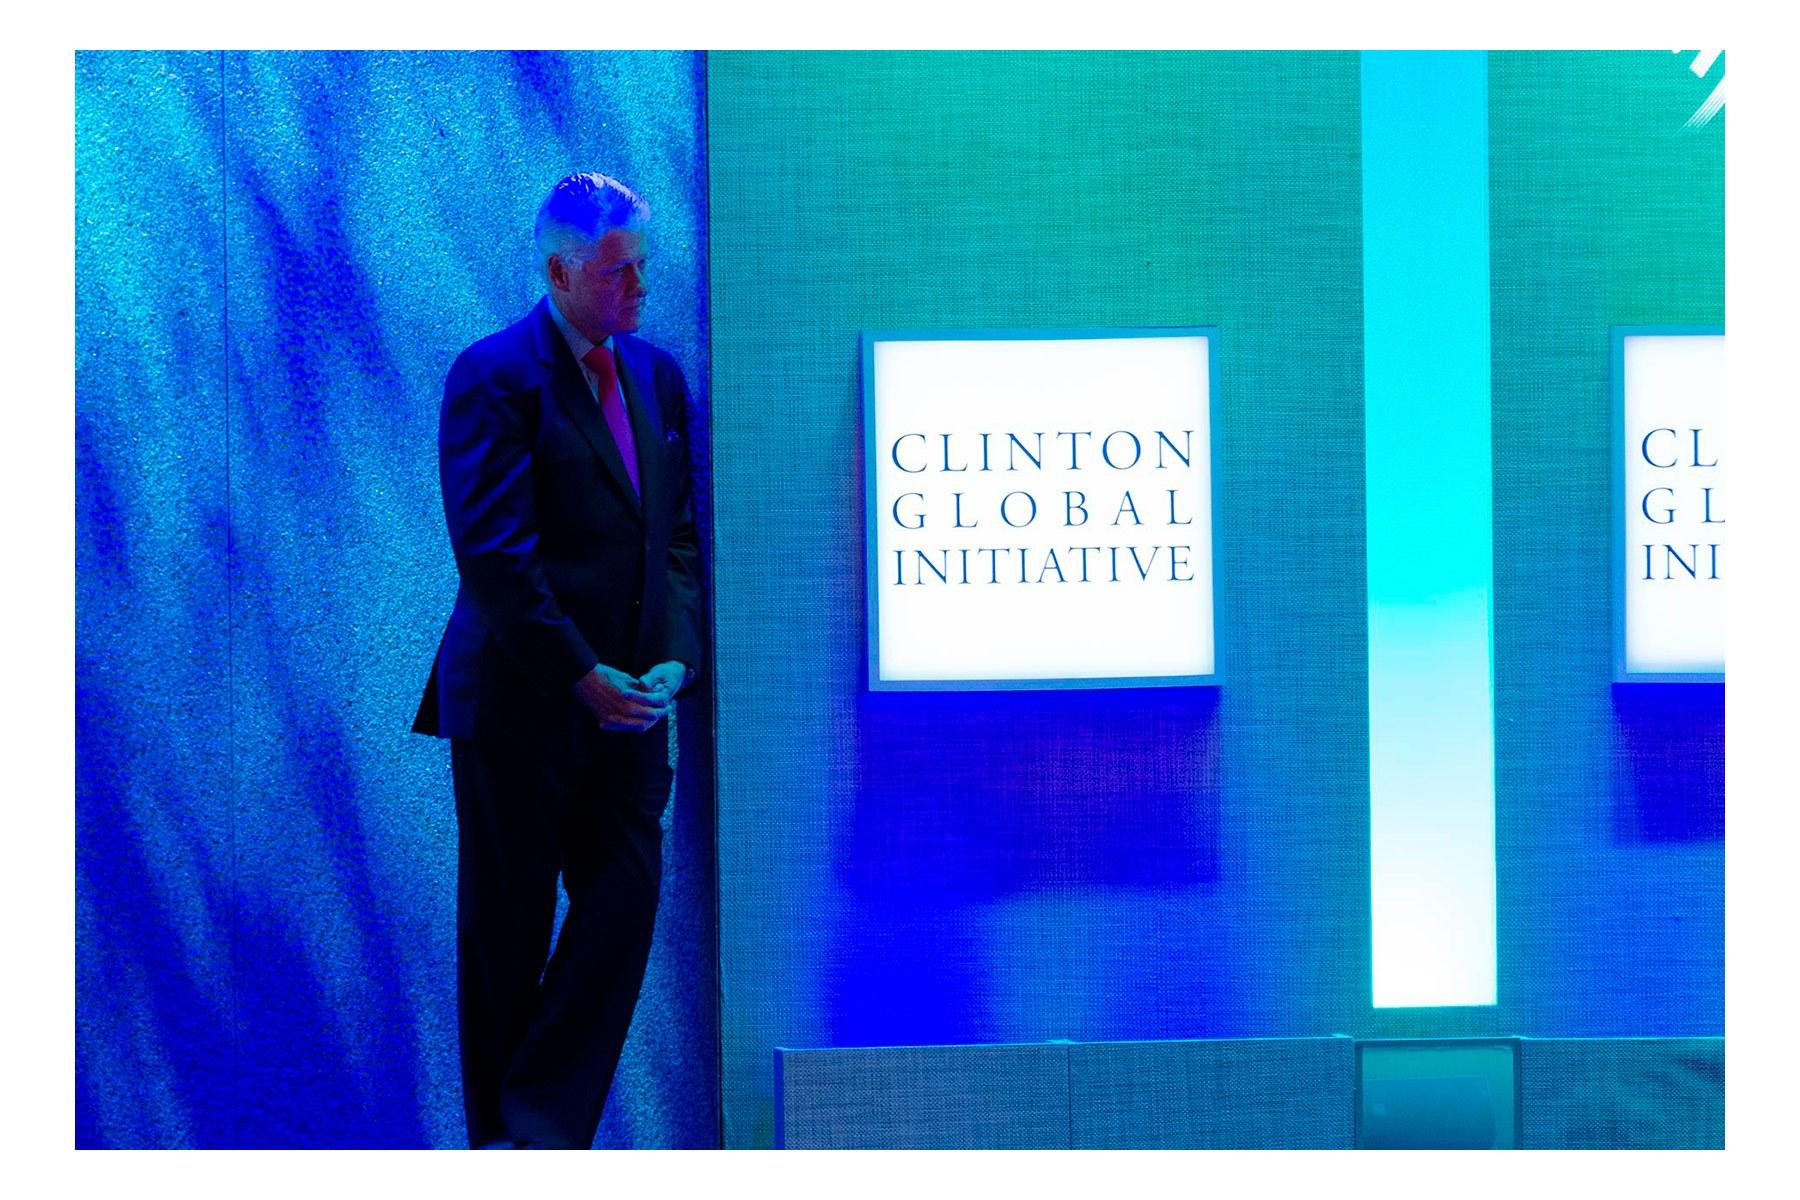 President Barack Obama, 44th President of the United States; Clinton Global Initiative 2011; 09-21-2011